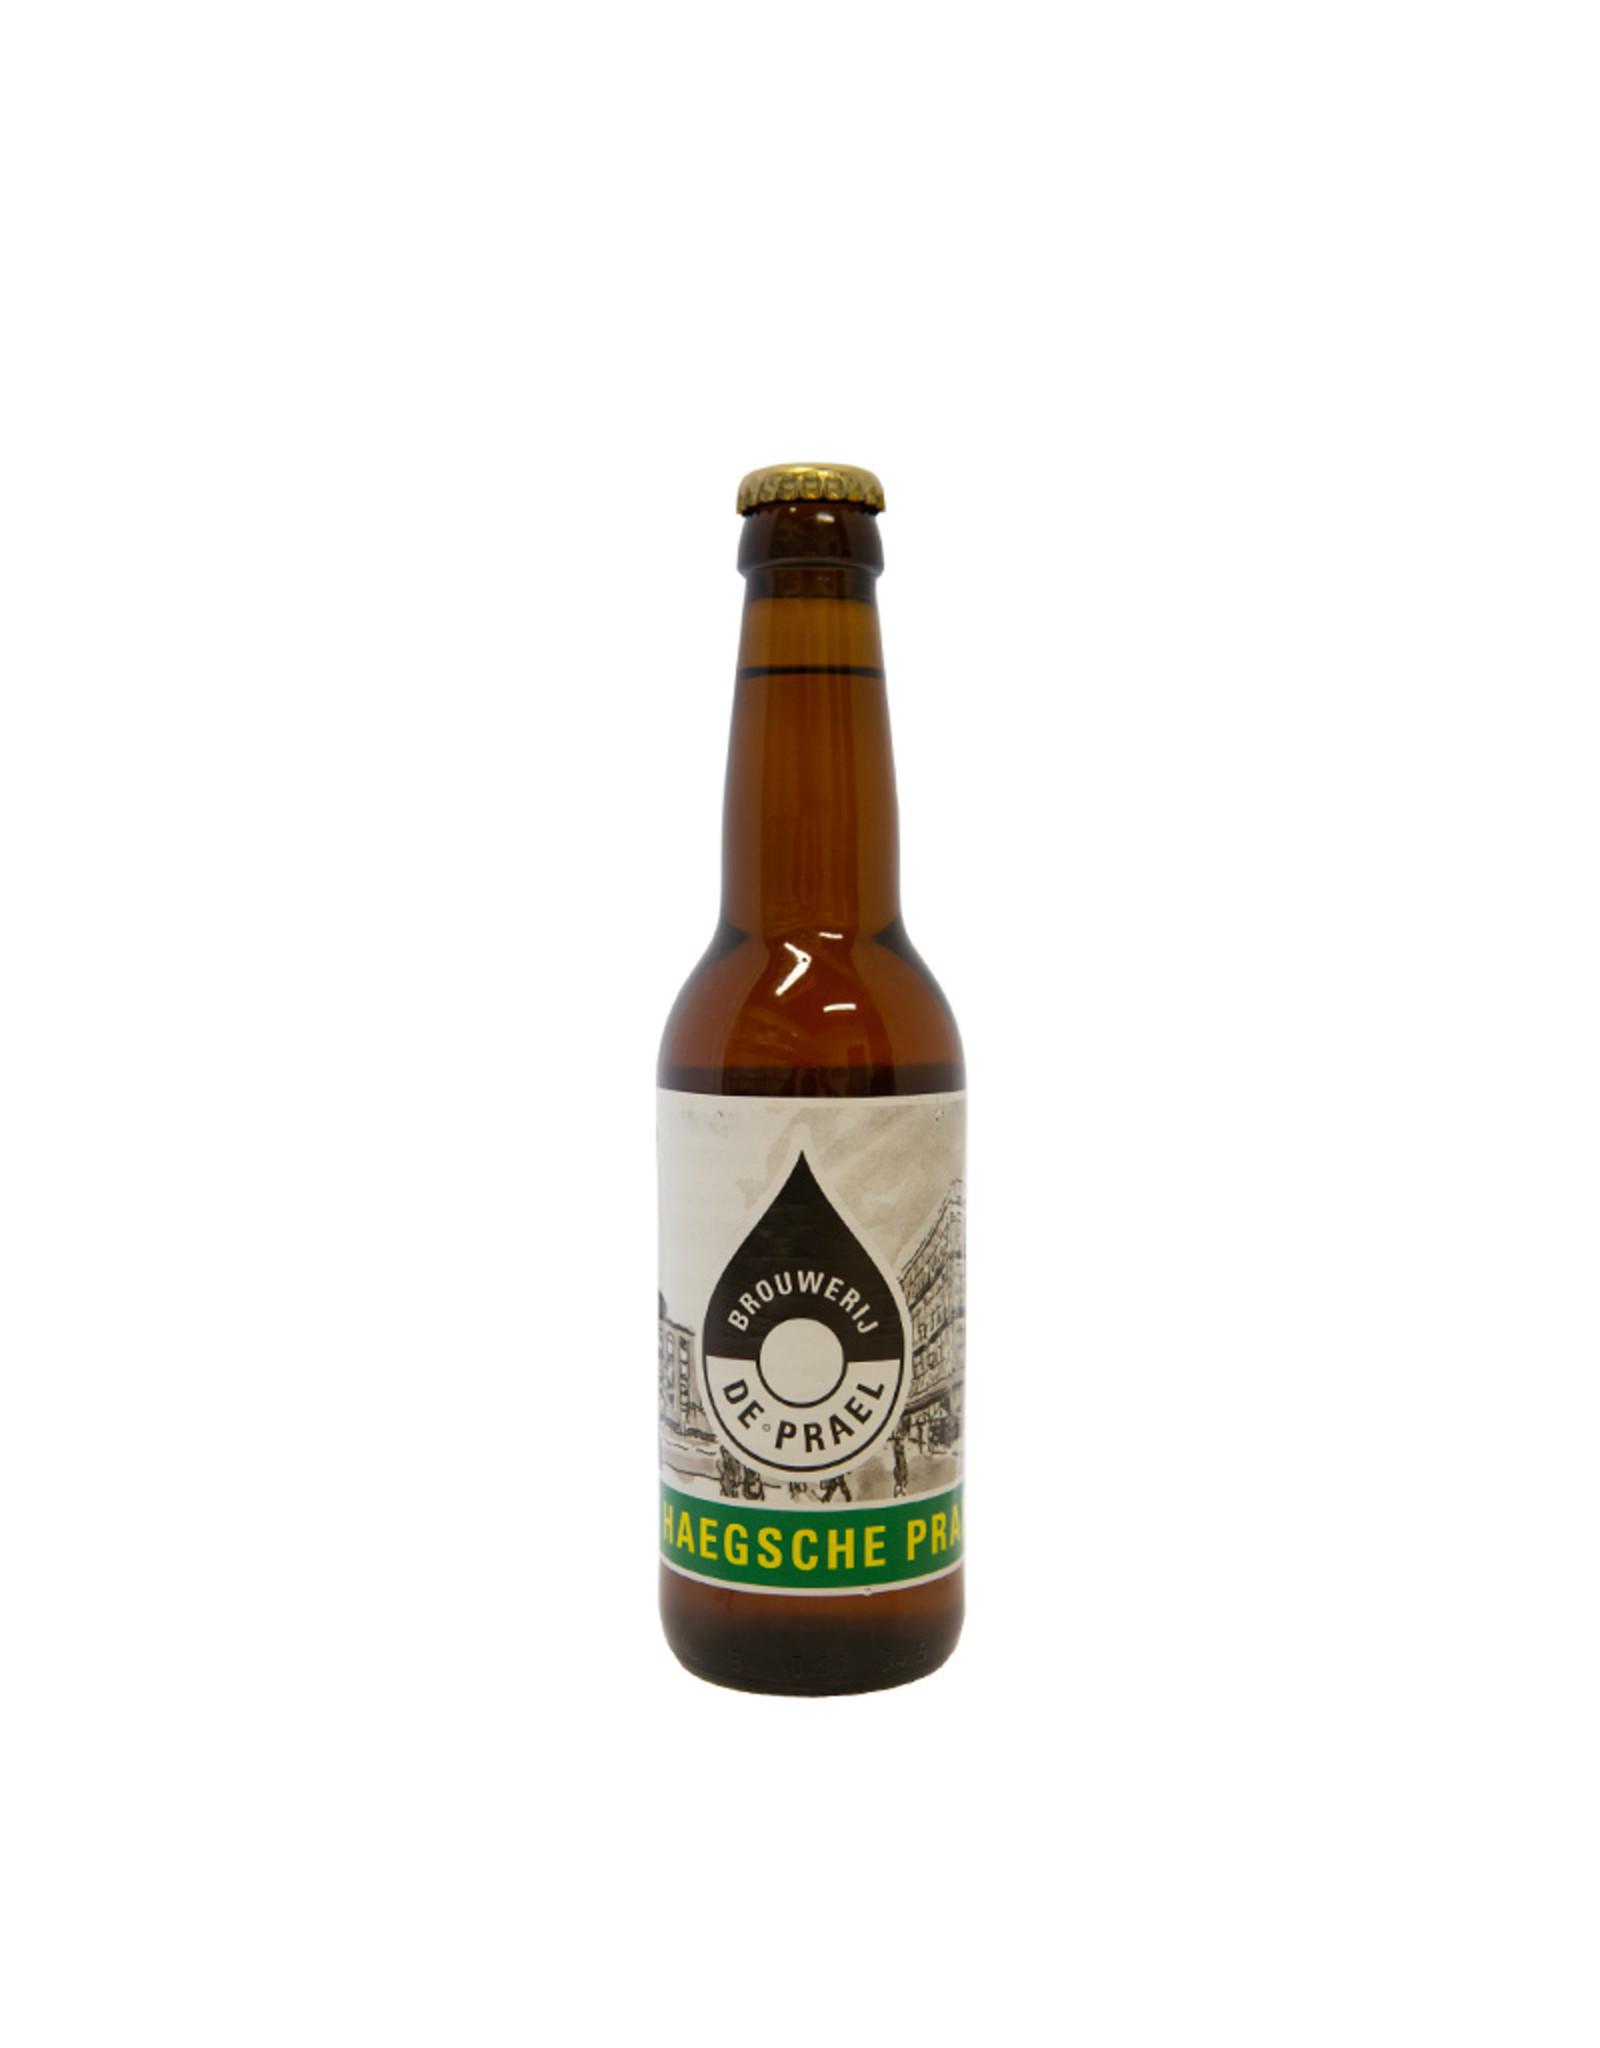 Brouwerij de Prael De Prael - Haegsche Prael